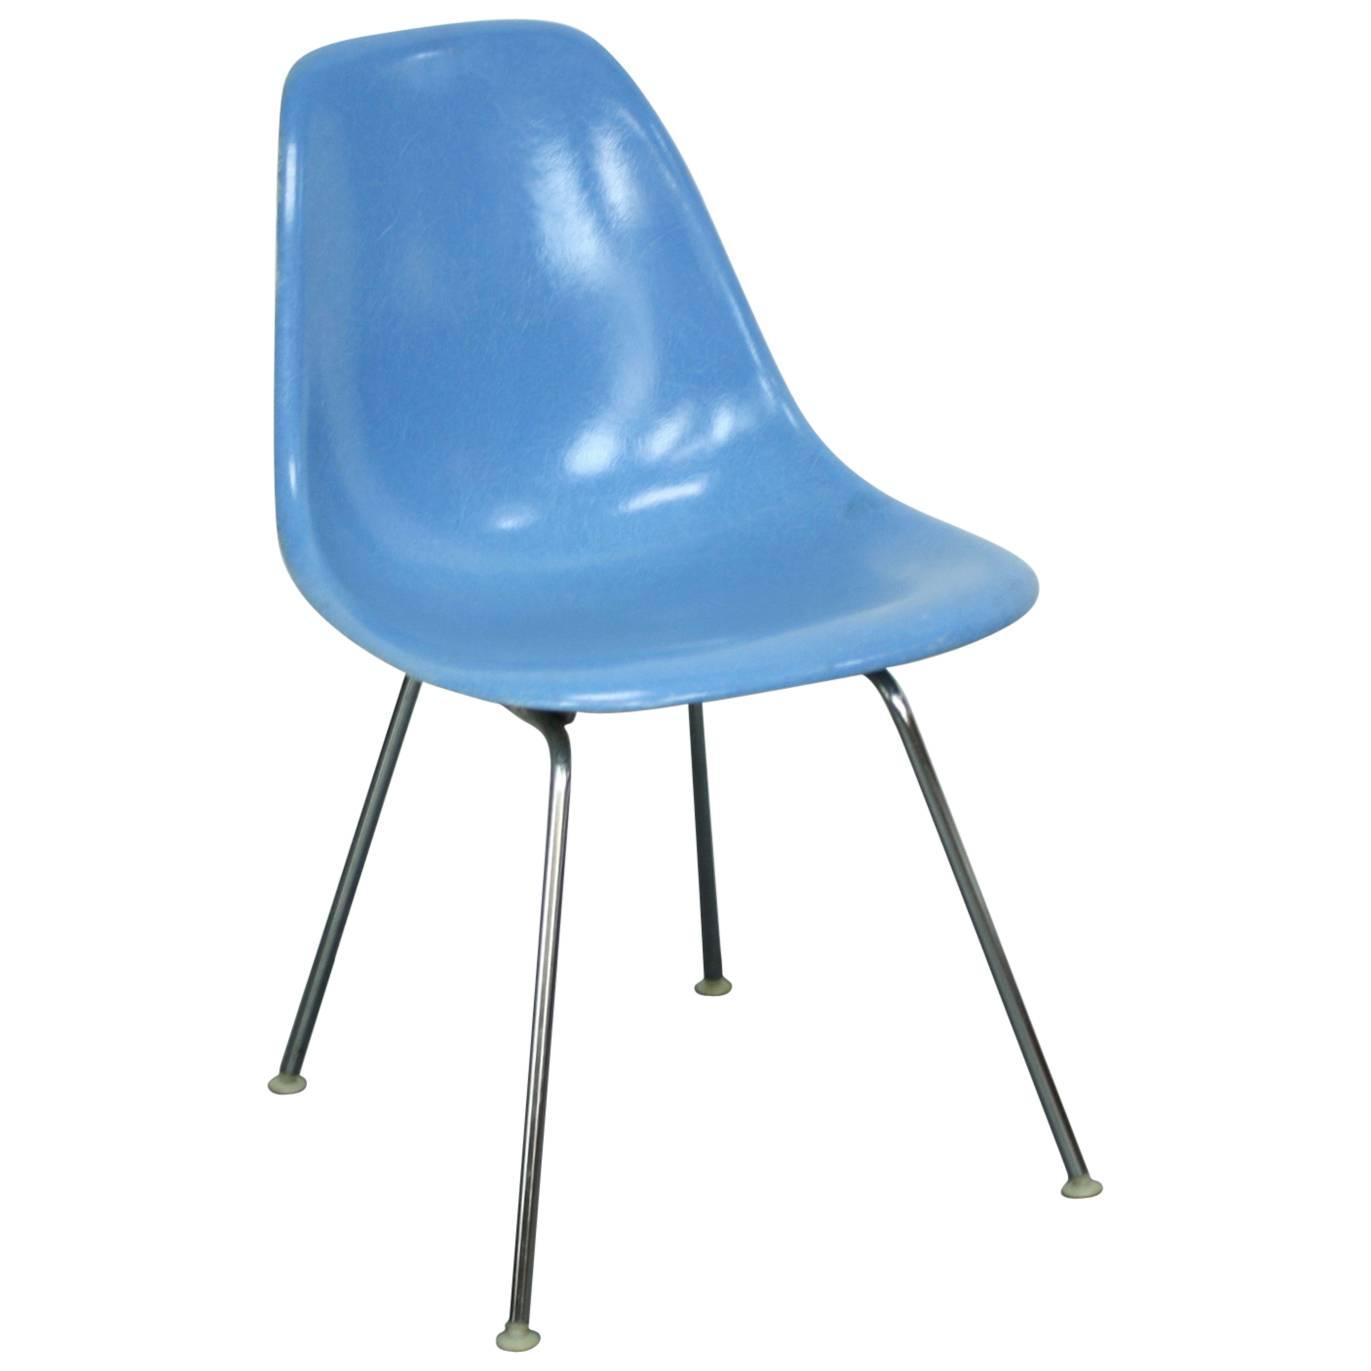 Charles Eames Herman Miller Dss Chair In Blue On Original Metal H Base For Sa